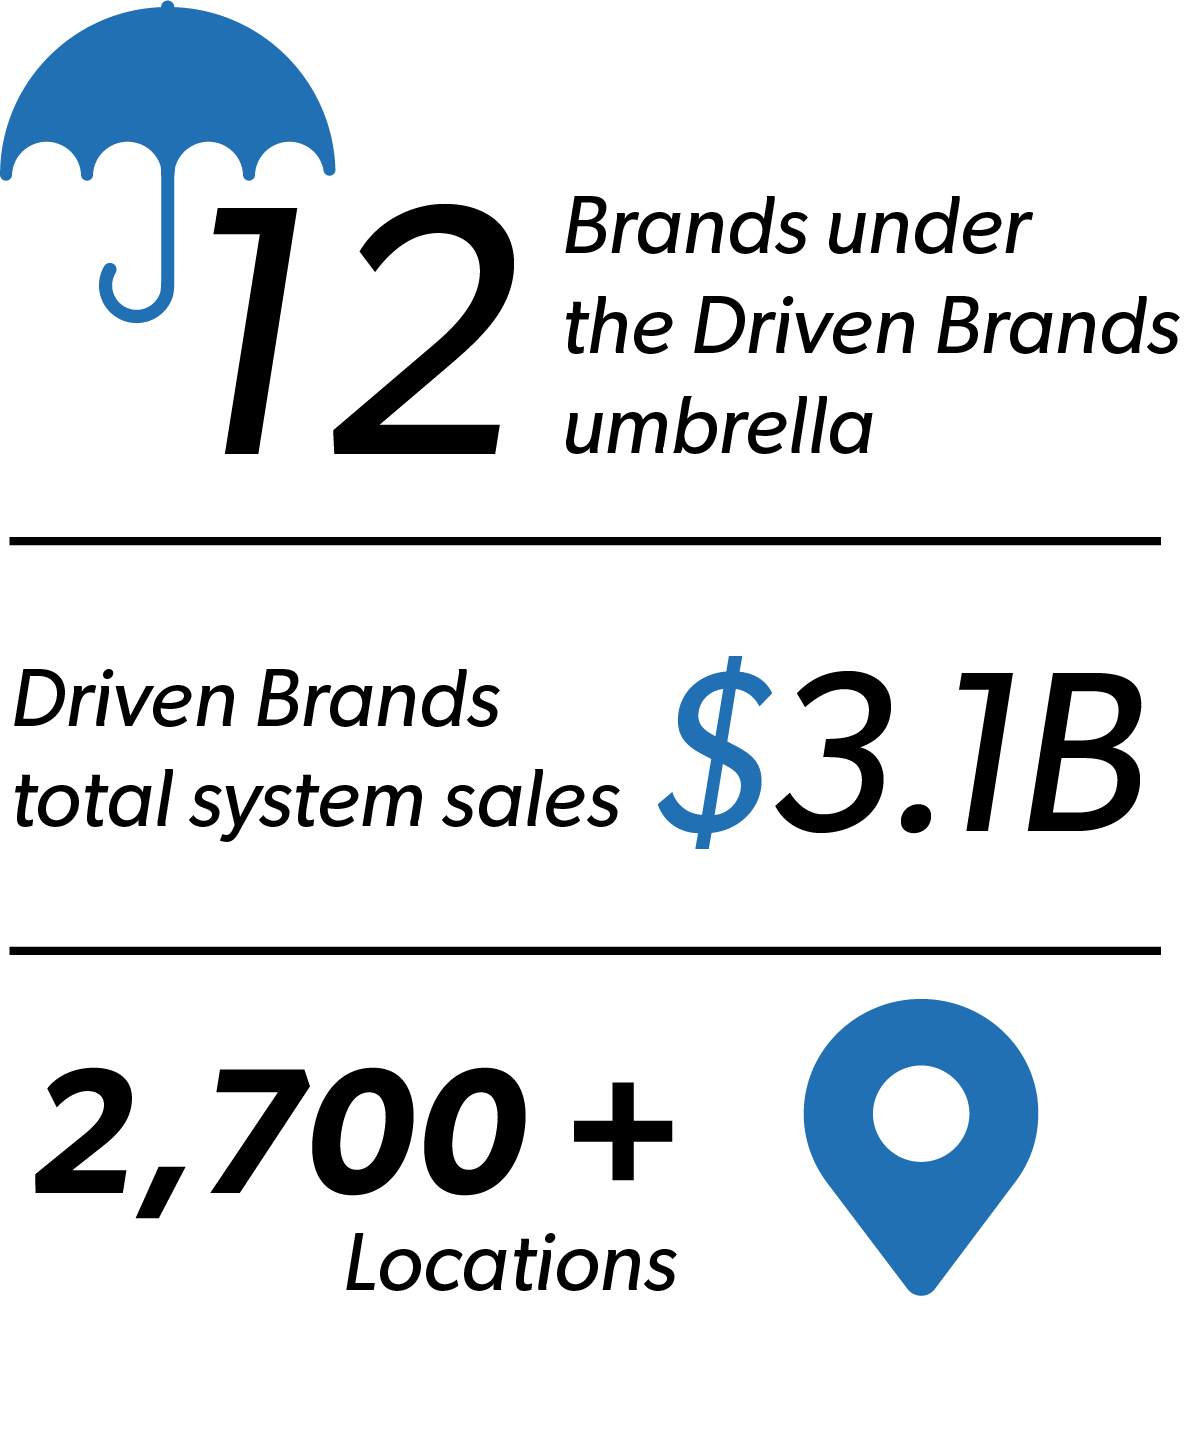 12 Brands under the Driven Brands umbrella, $3.1 Billion total sales, 2,700+ locations